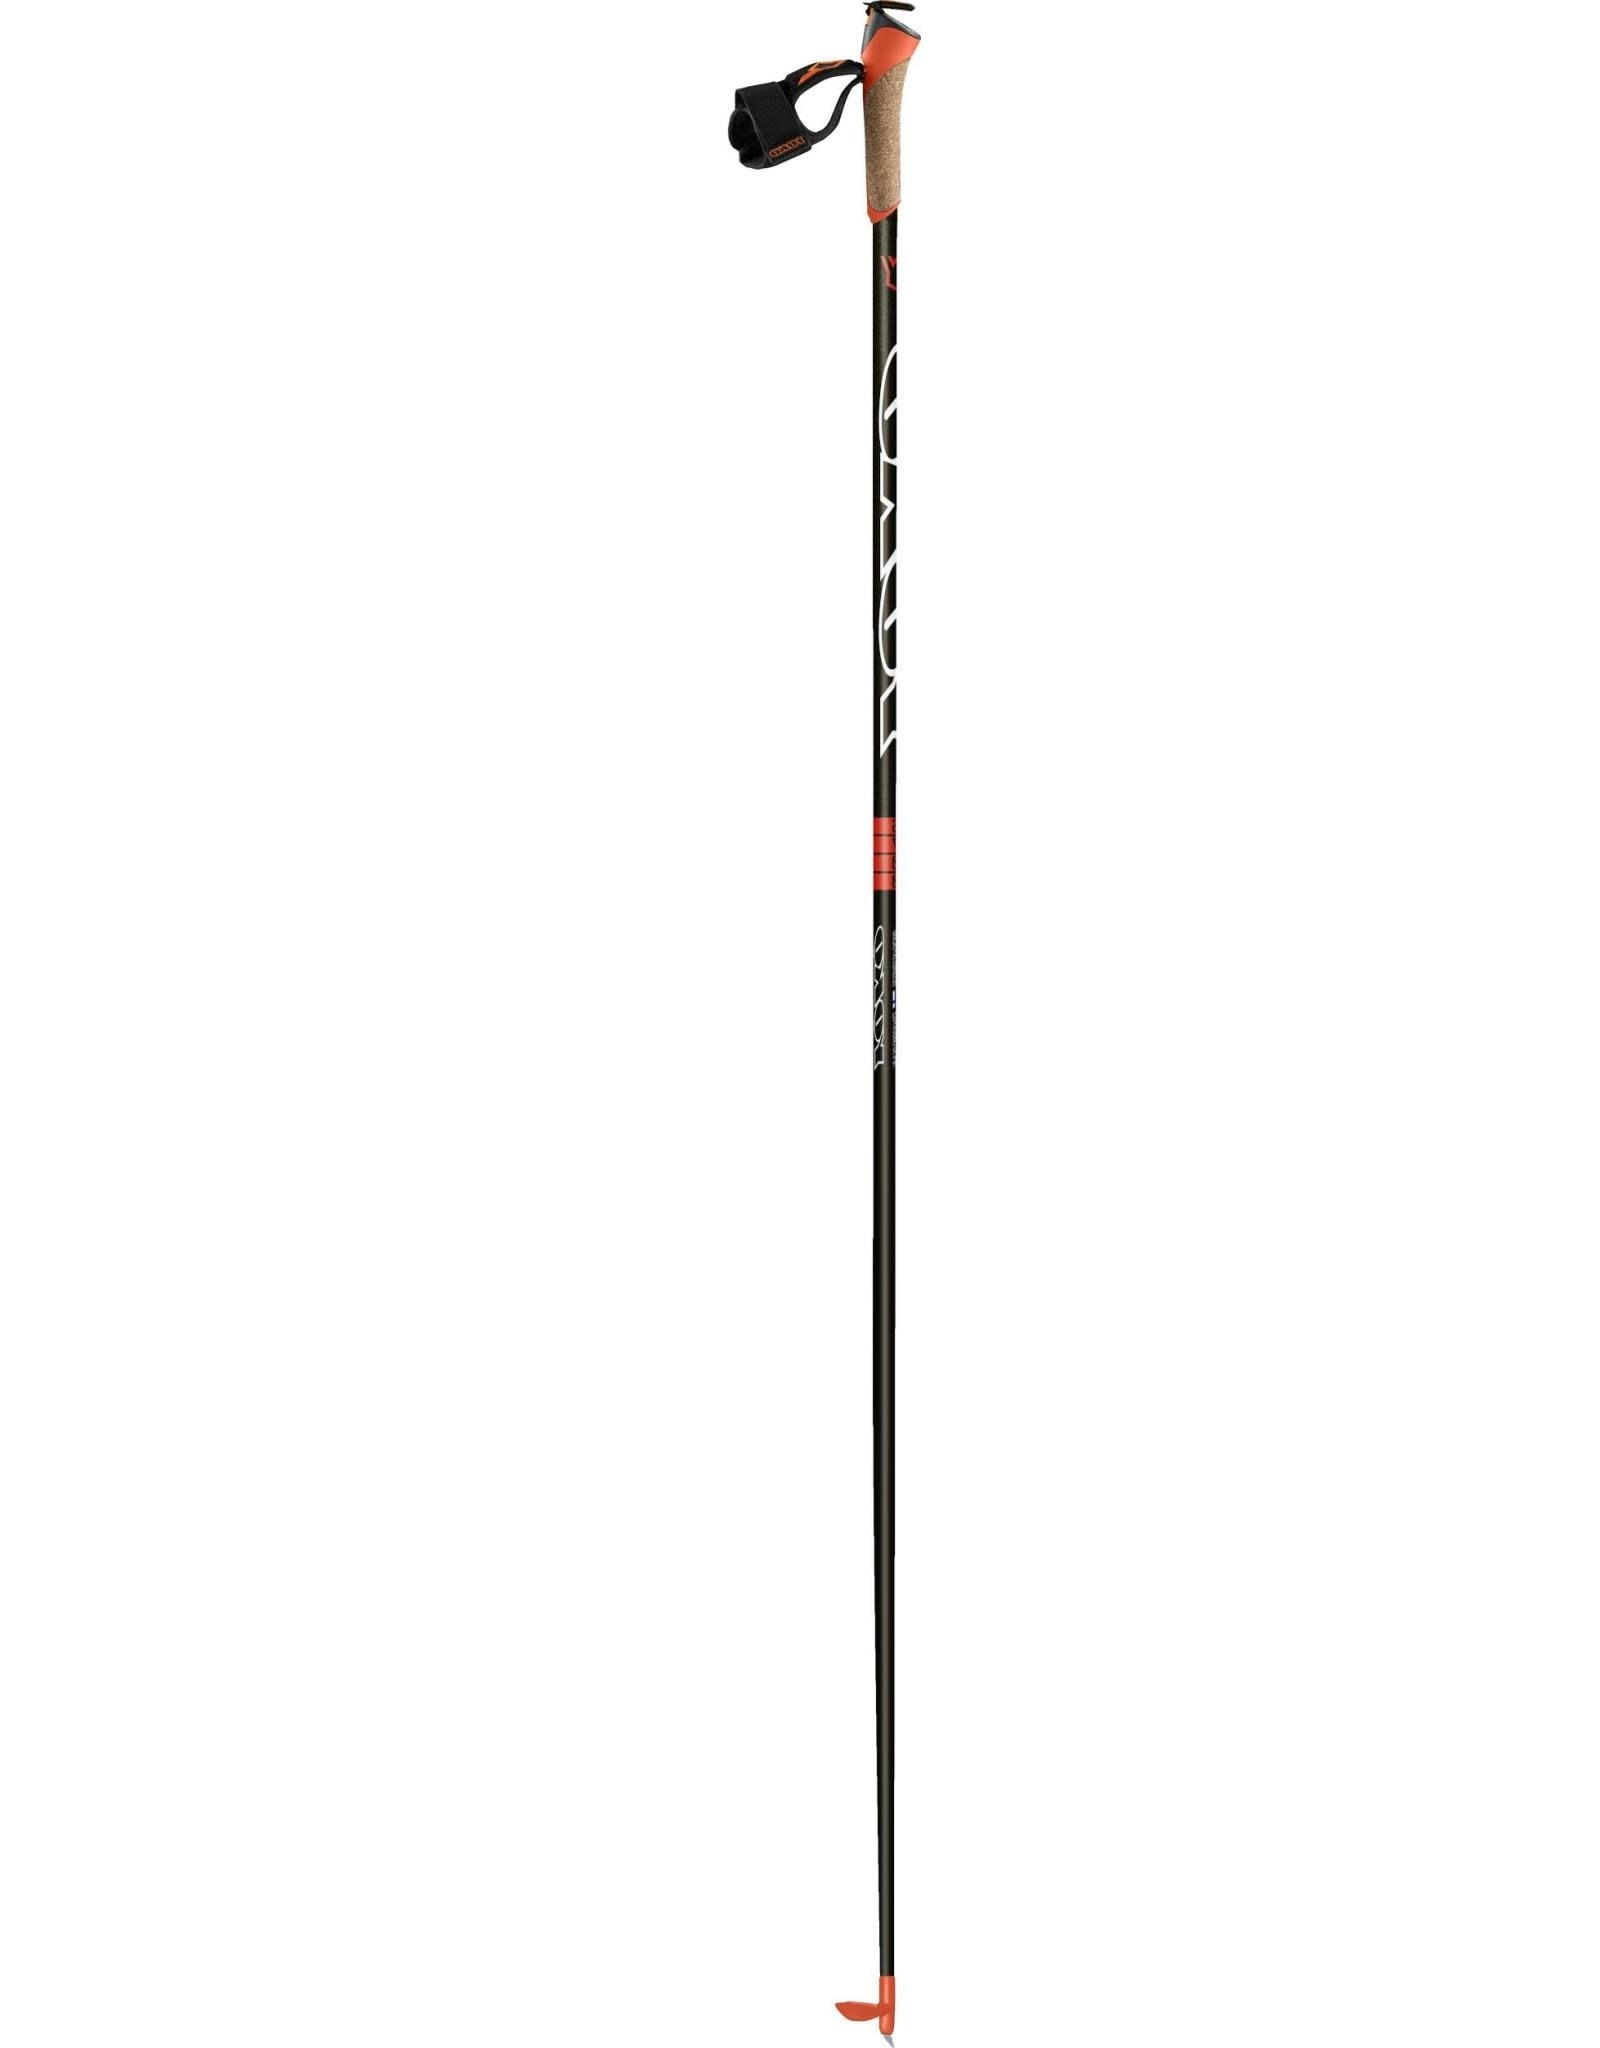 Yoko Yoko 6700 Series Pole